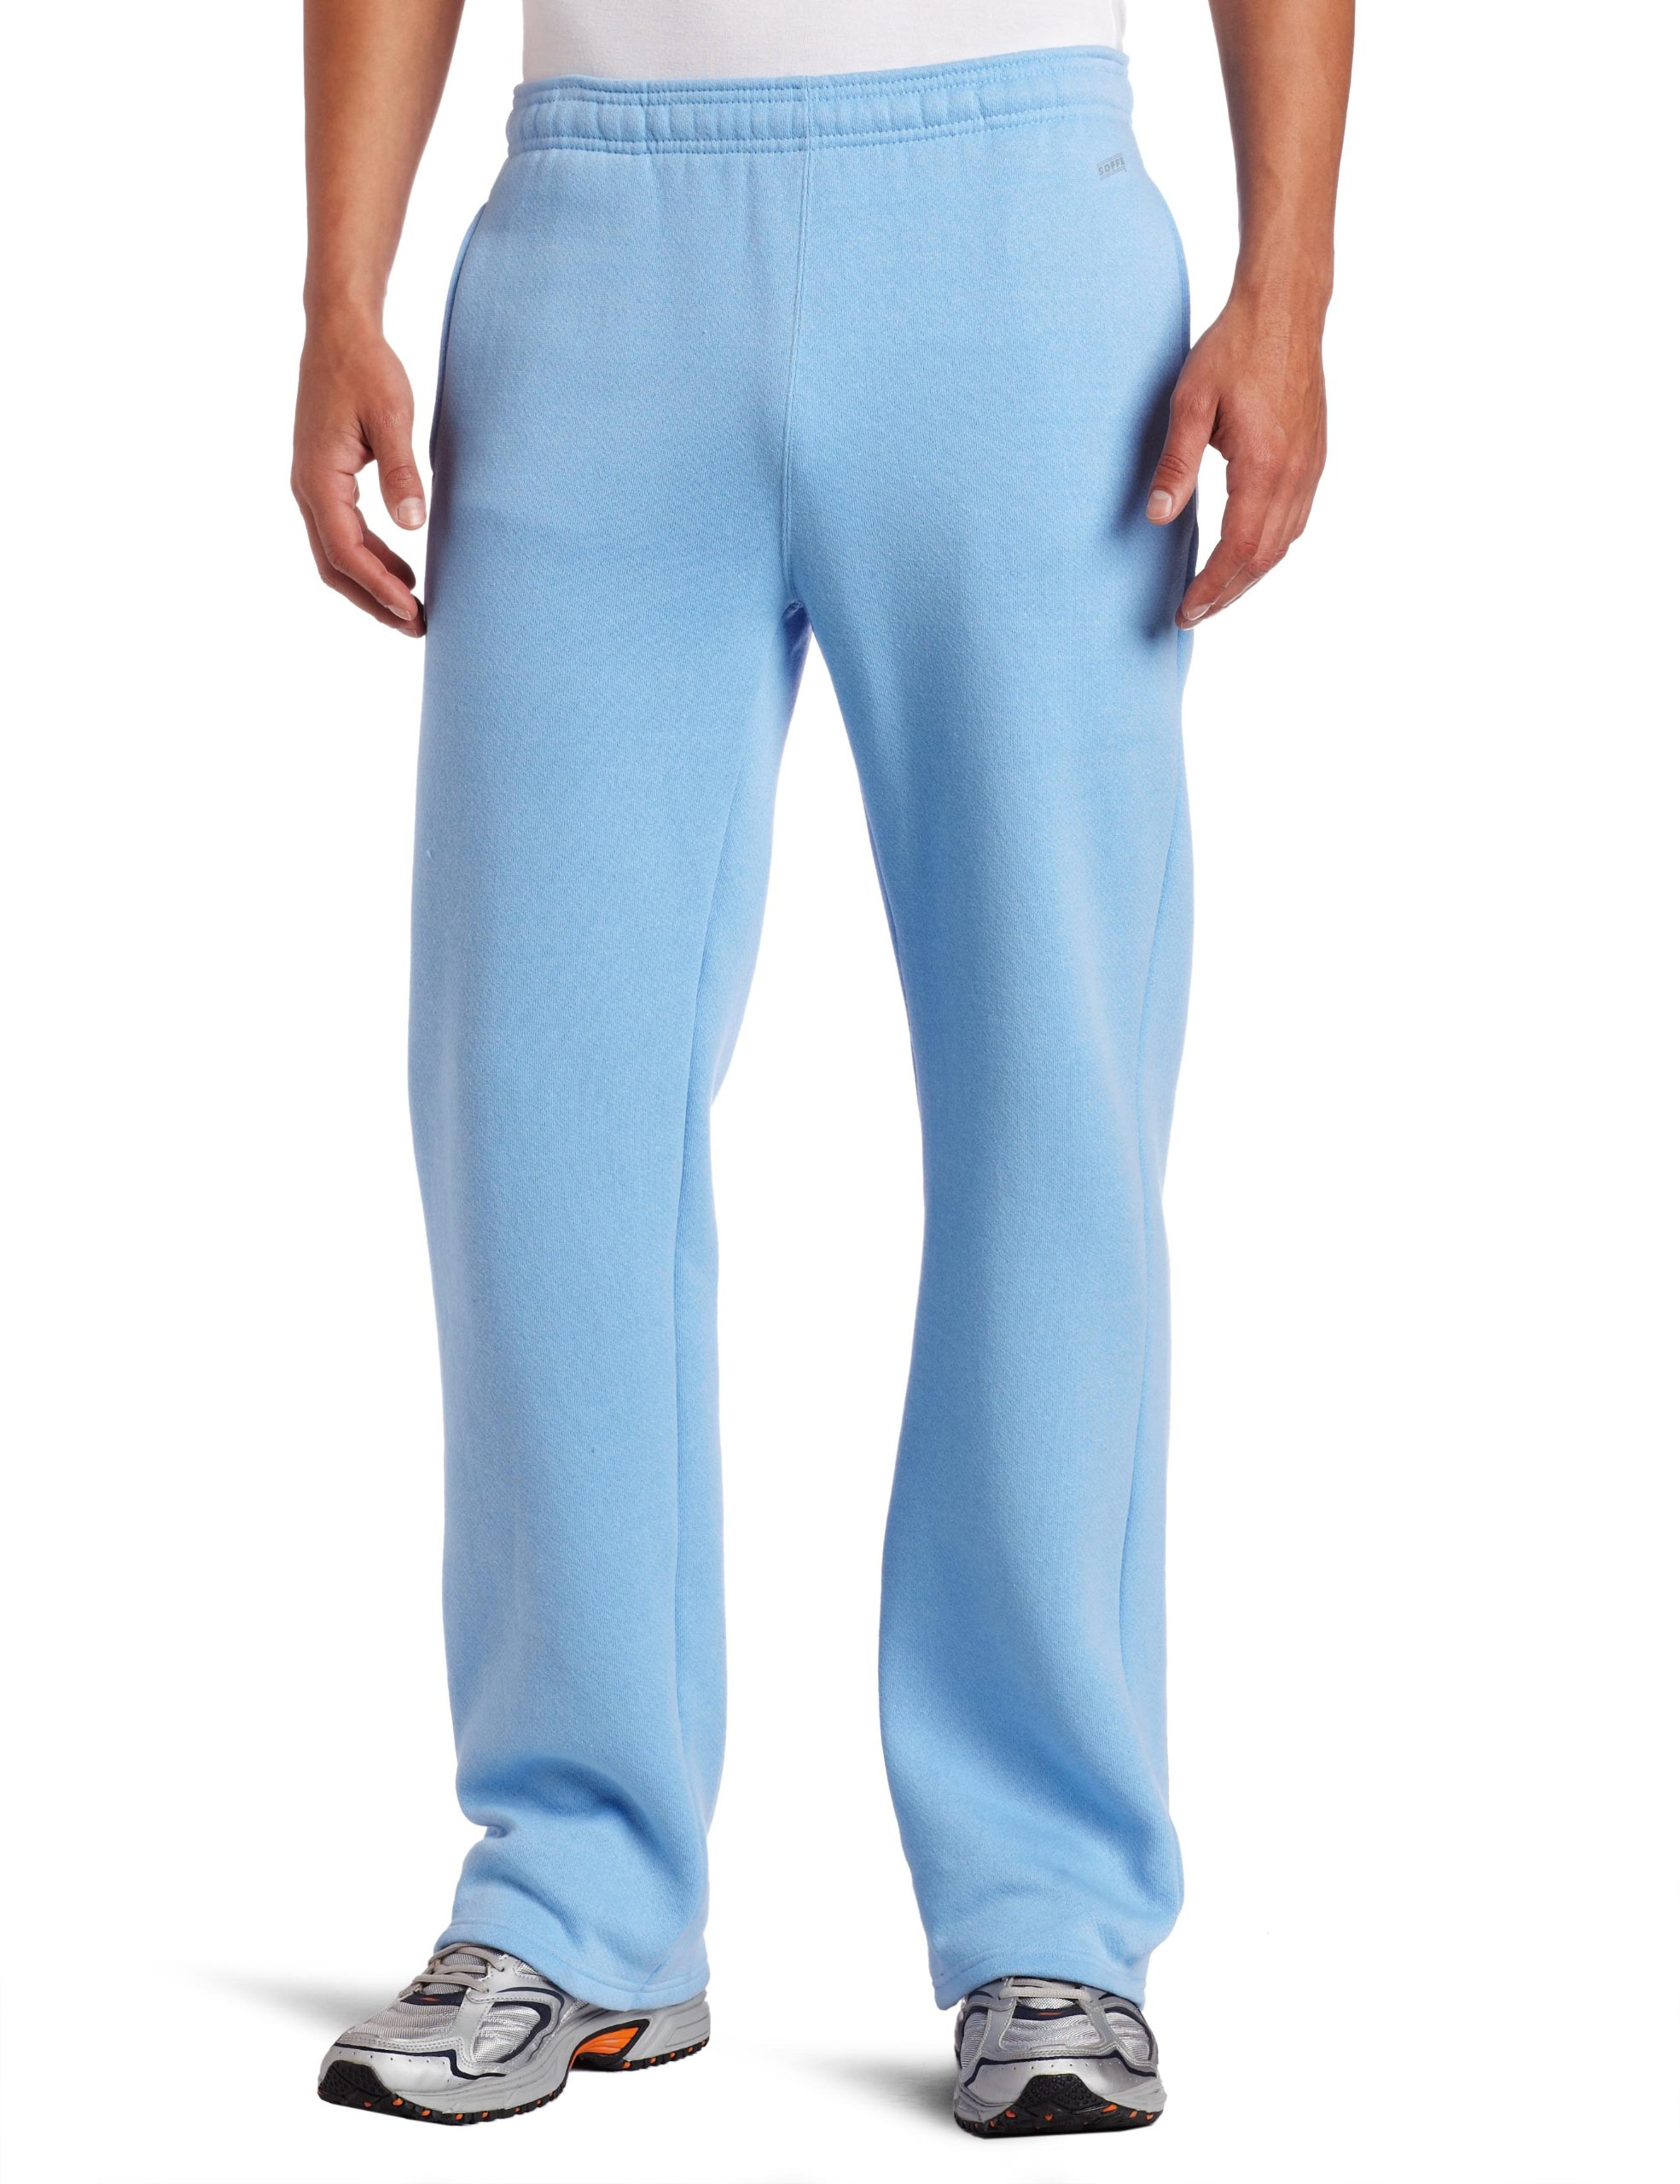 Soffe MJ Men's Training Fleece Pocket Pant, Light Blue Small